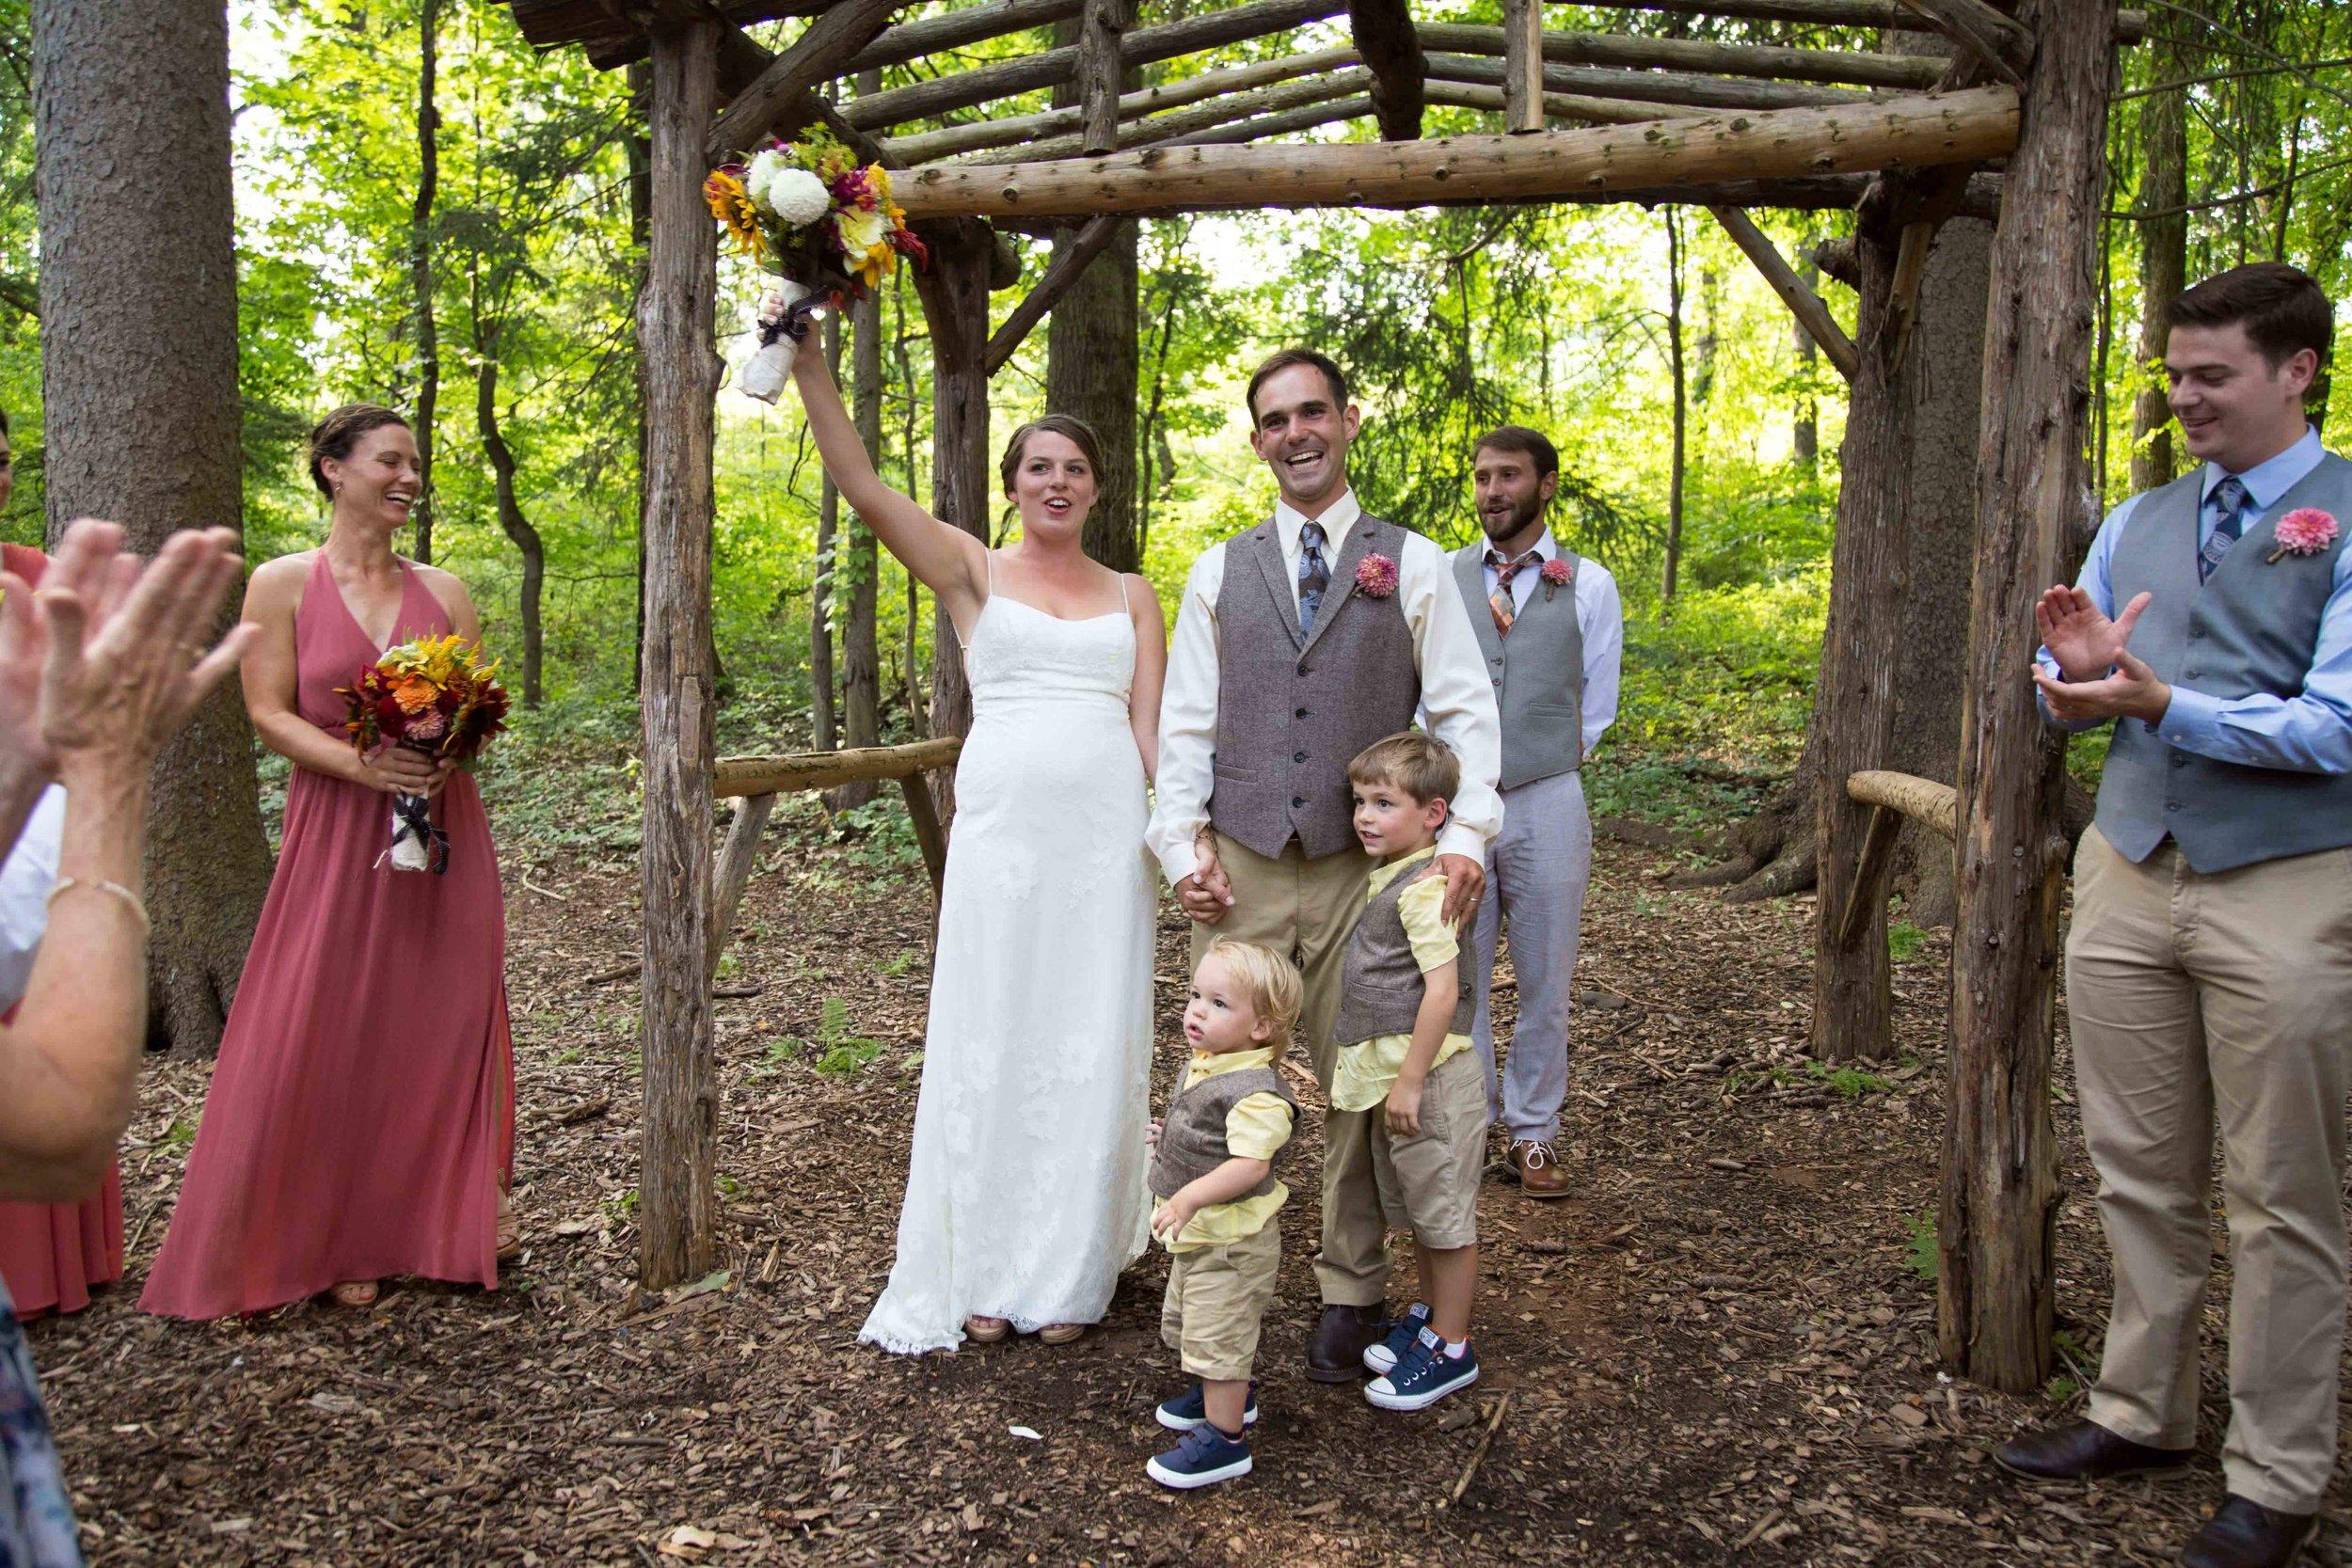 Maskers Barn Deserted Village Berkley Heights NJ Wedding Photographer-39.jpg